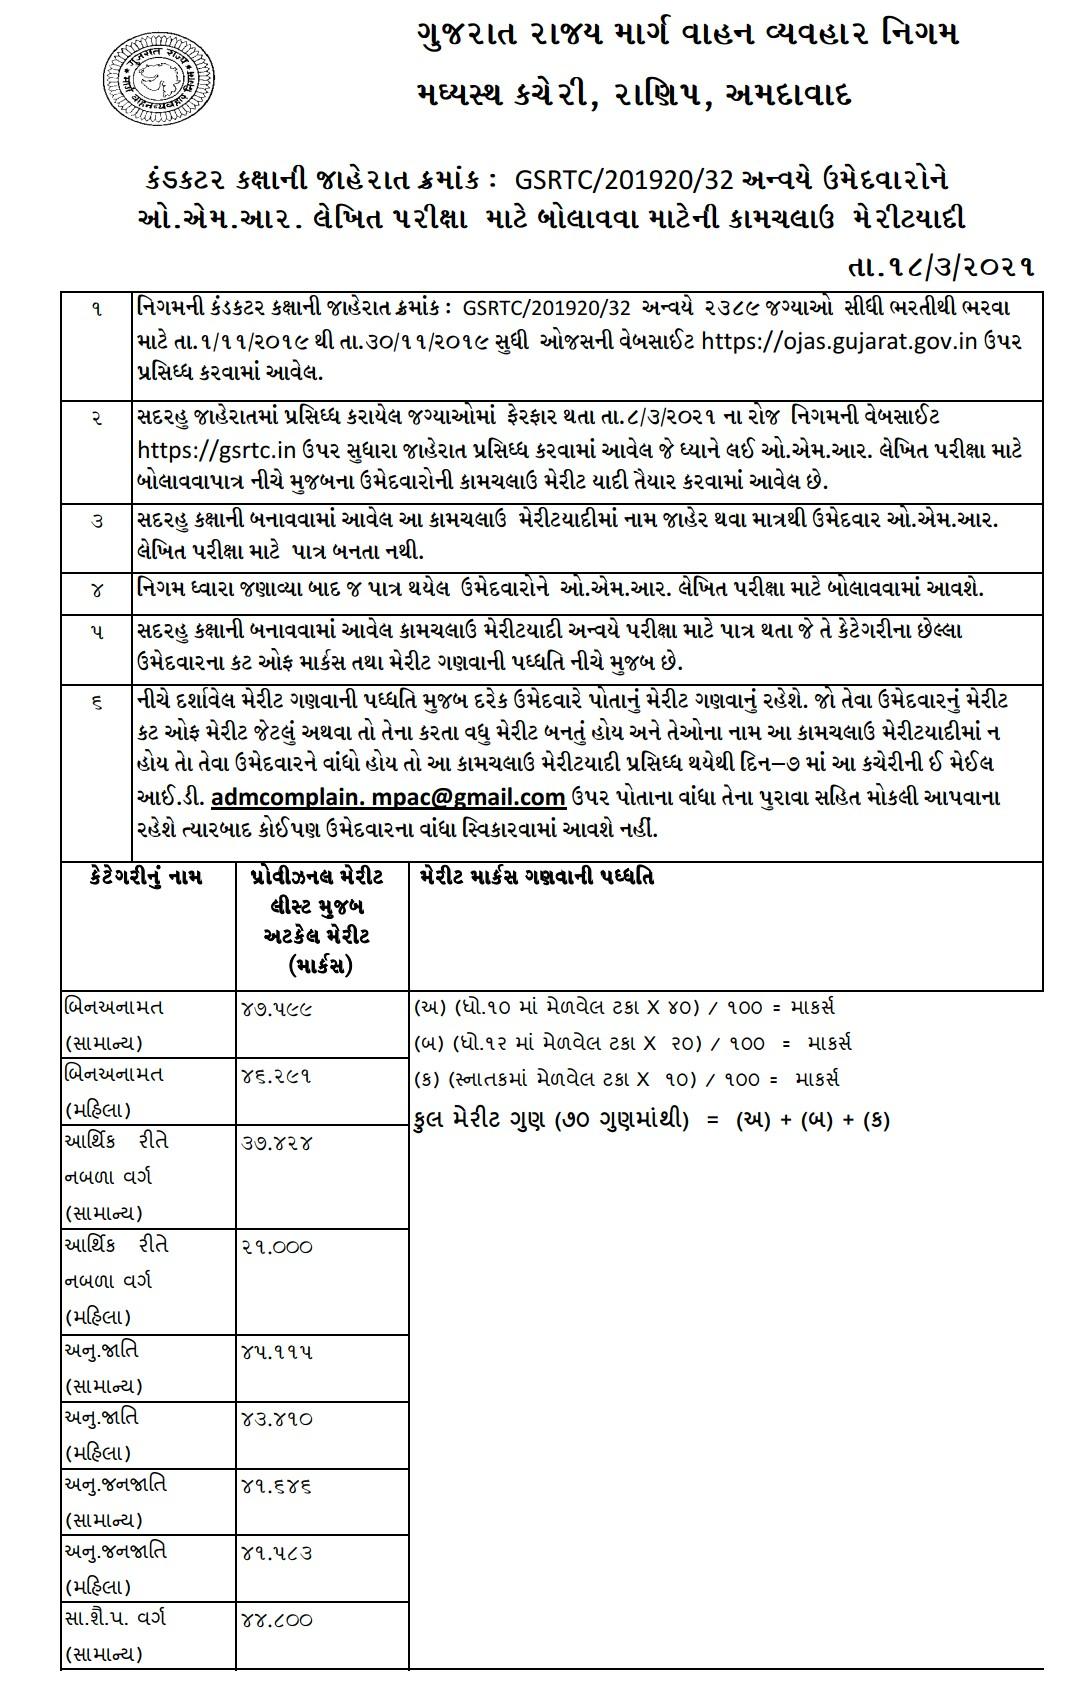 GSRTC Conductor Provisional O.M.R. Merit list , 2021